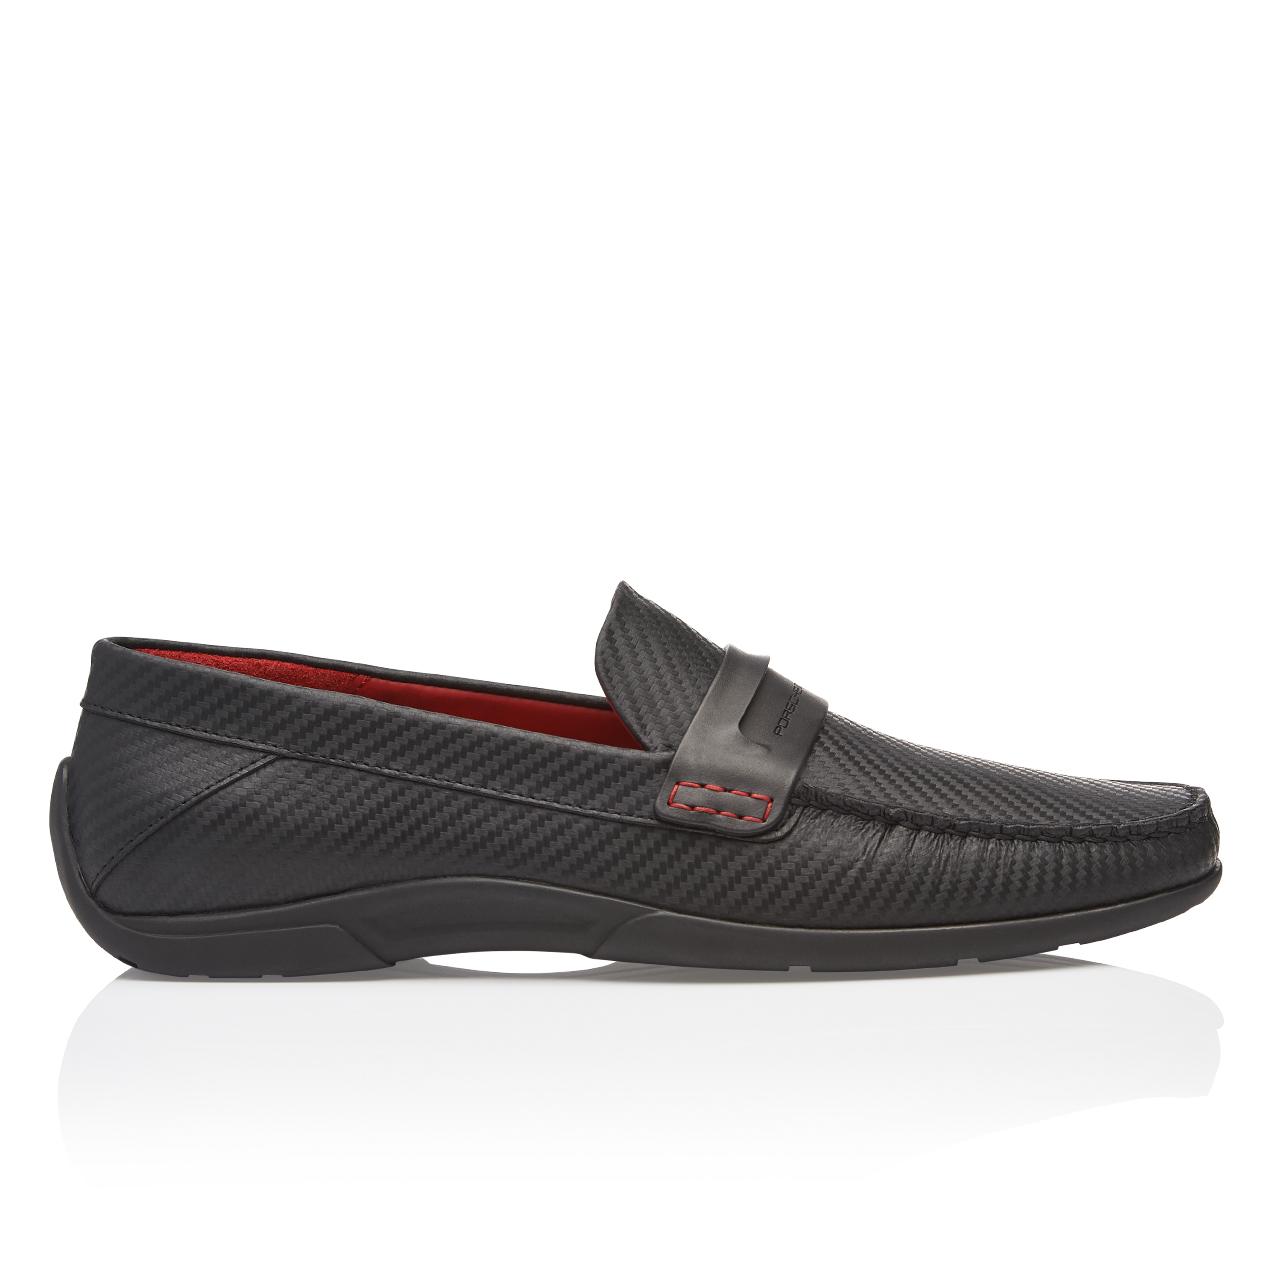 Driver Carbon Design Moccasin - Shoes